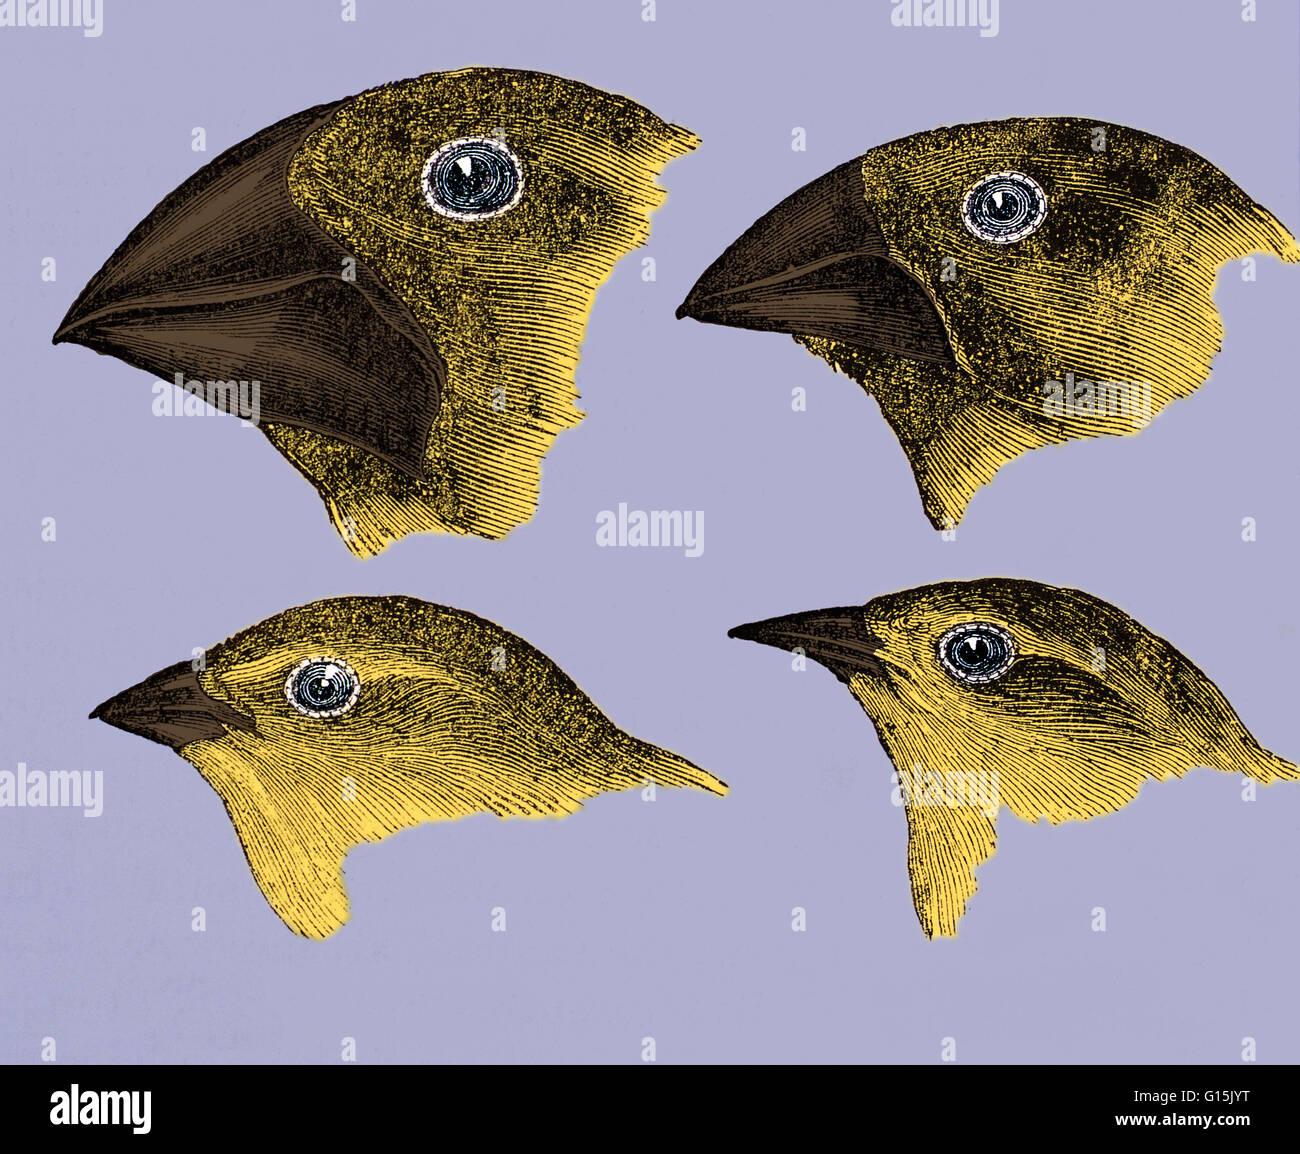 Charles Darwin Finches Stock Photos Amp Charles Darwin